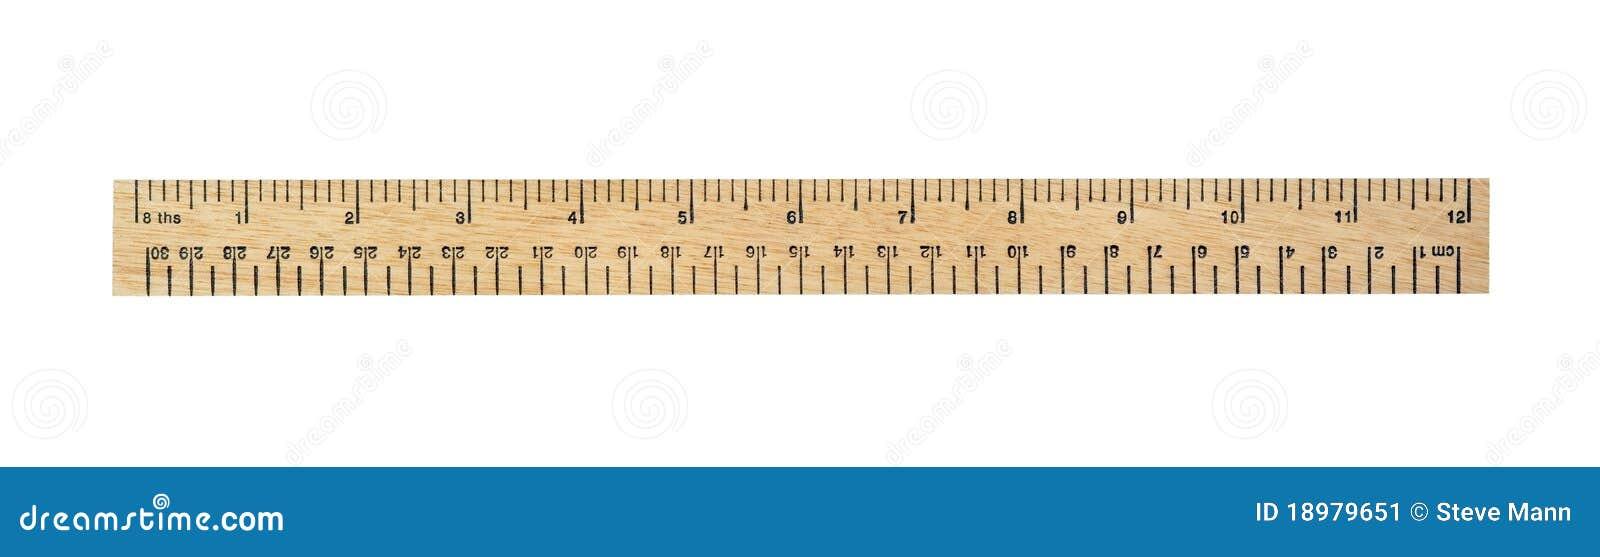 Download Ruler stock image. Image of mathematics, long, centimeter - 18979651